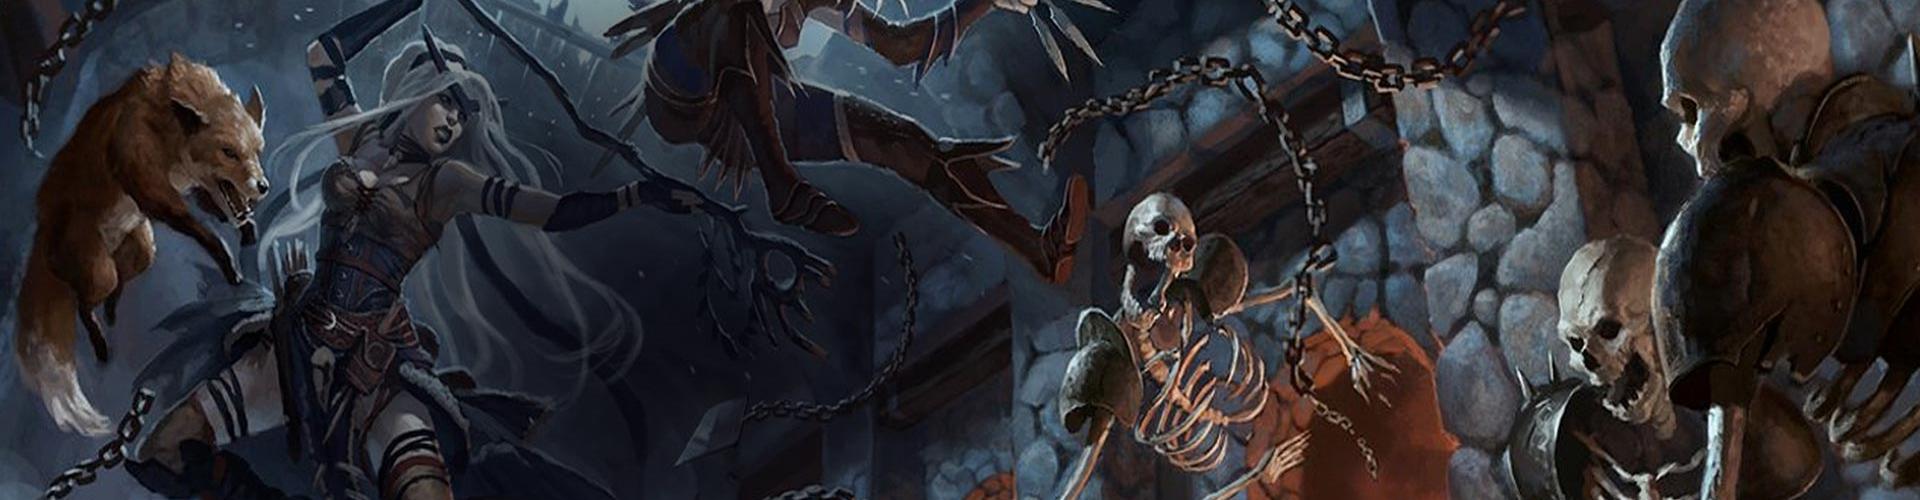 Coming Soon: D&D Adventurers League!